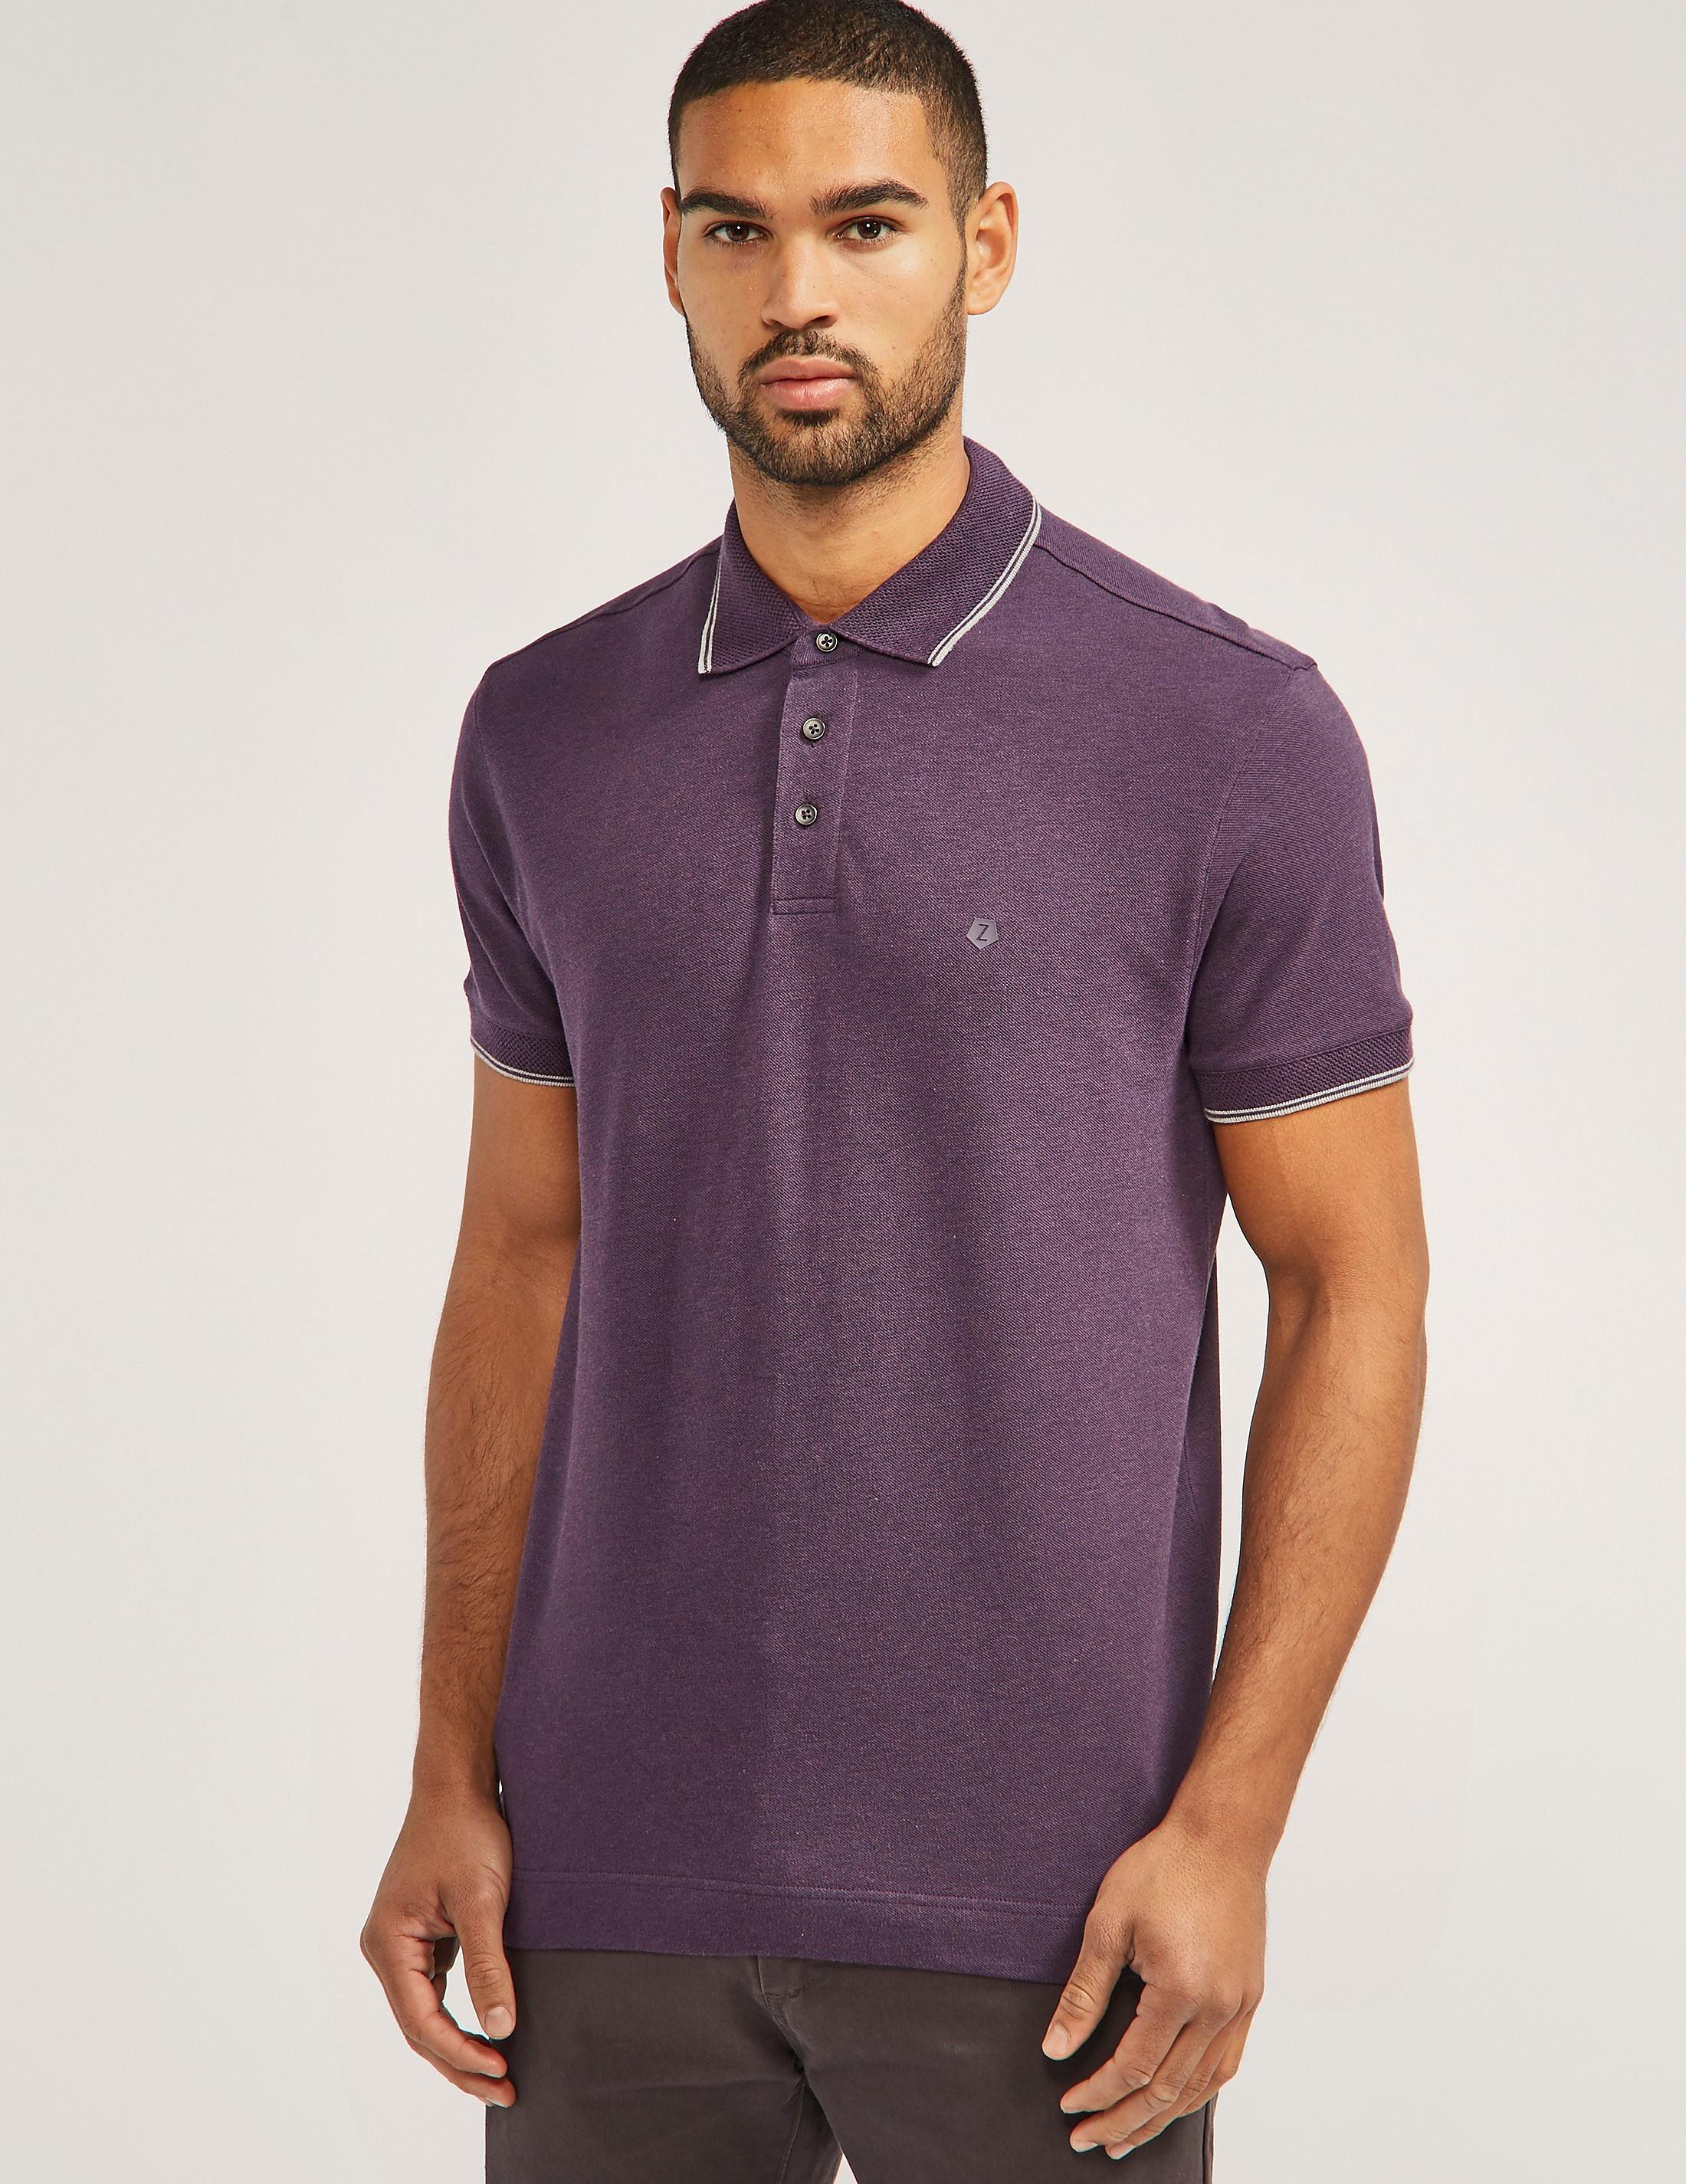 Z Zegna Short Sleeve Polo Shirt